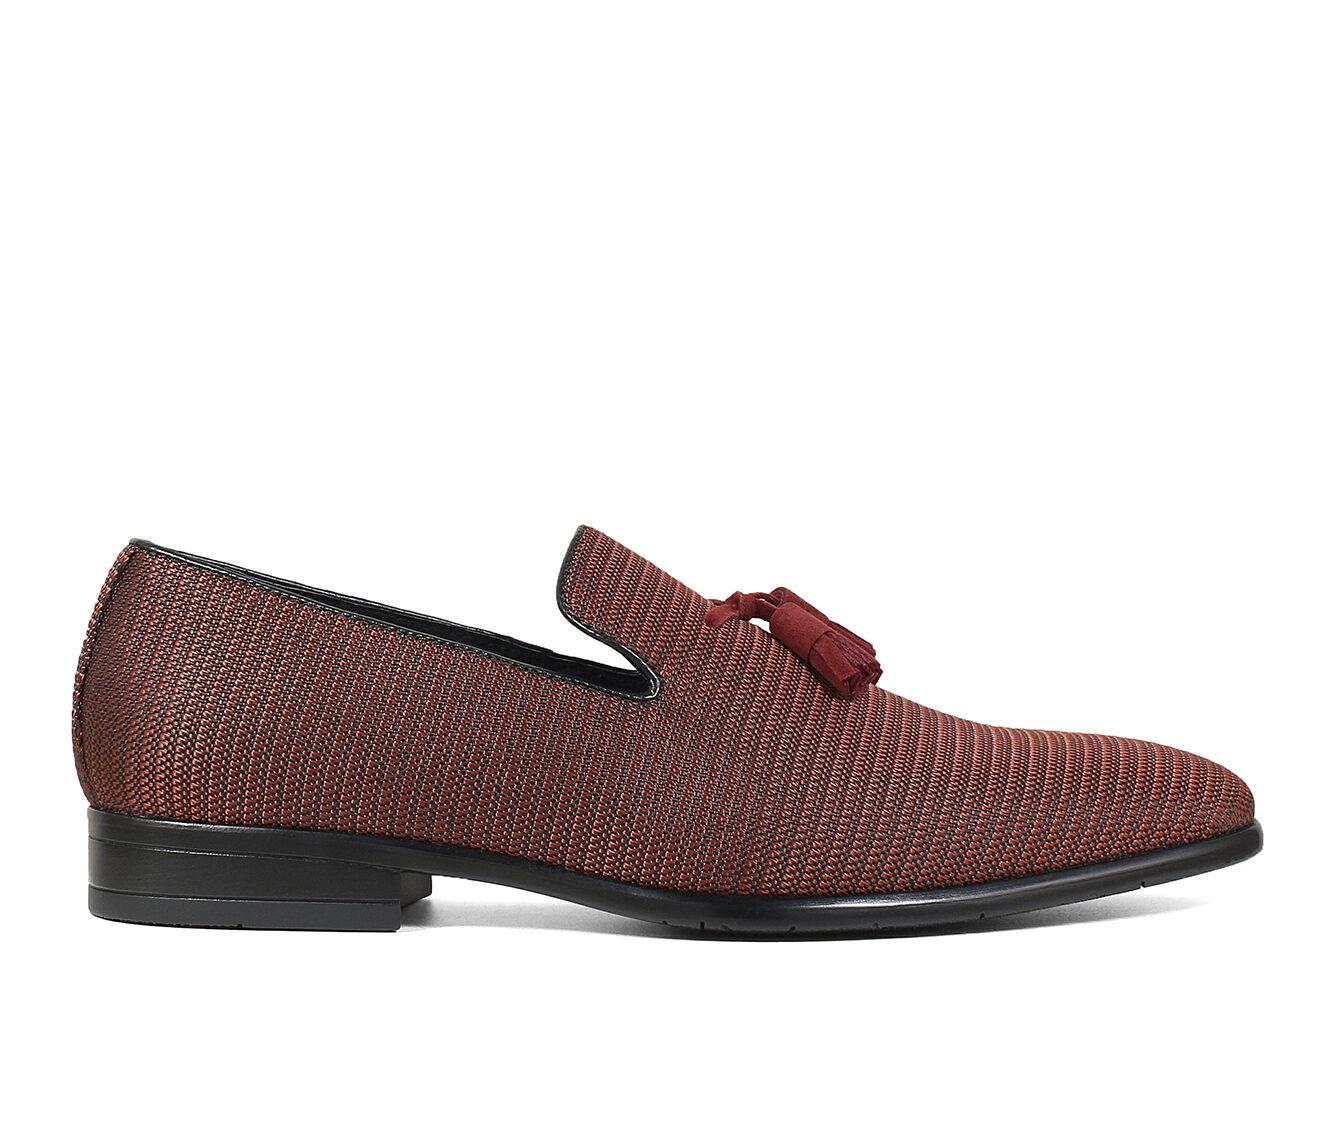 Men's Stacy Adams Tazewell Dress Shoes Brick